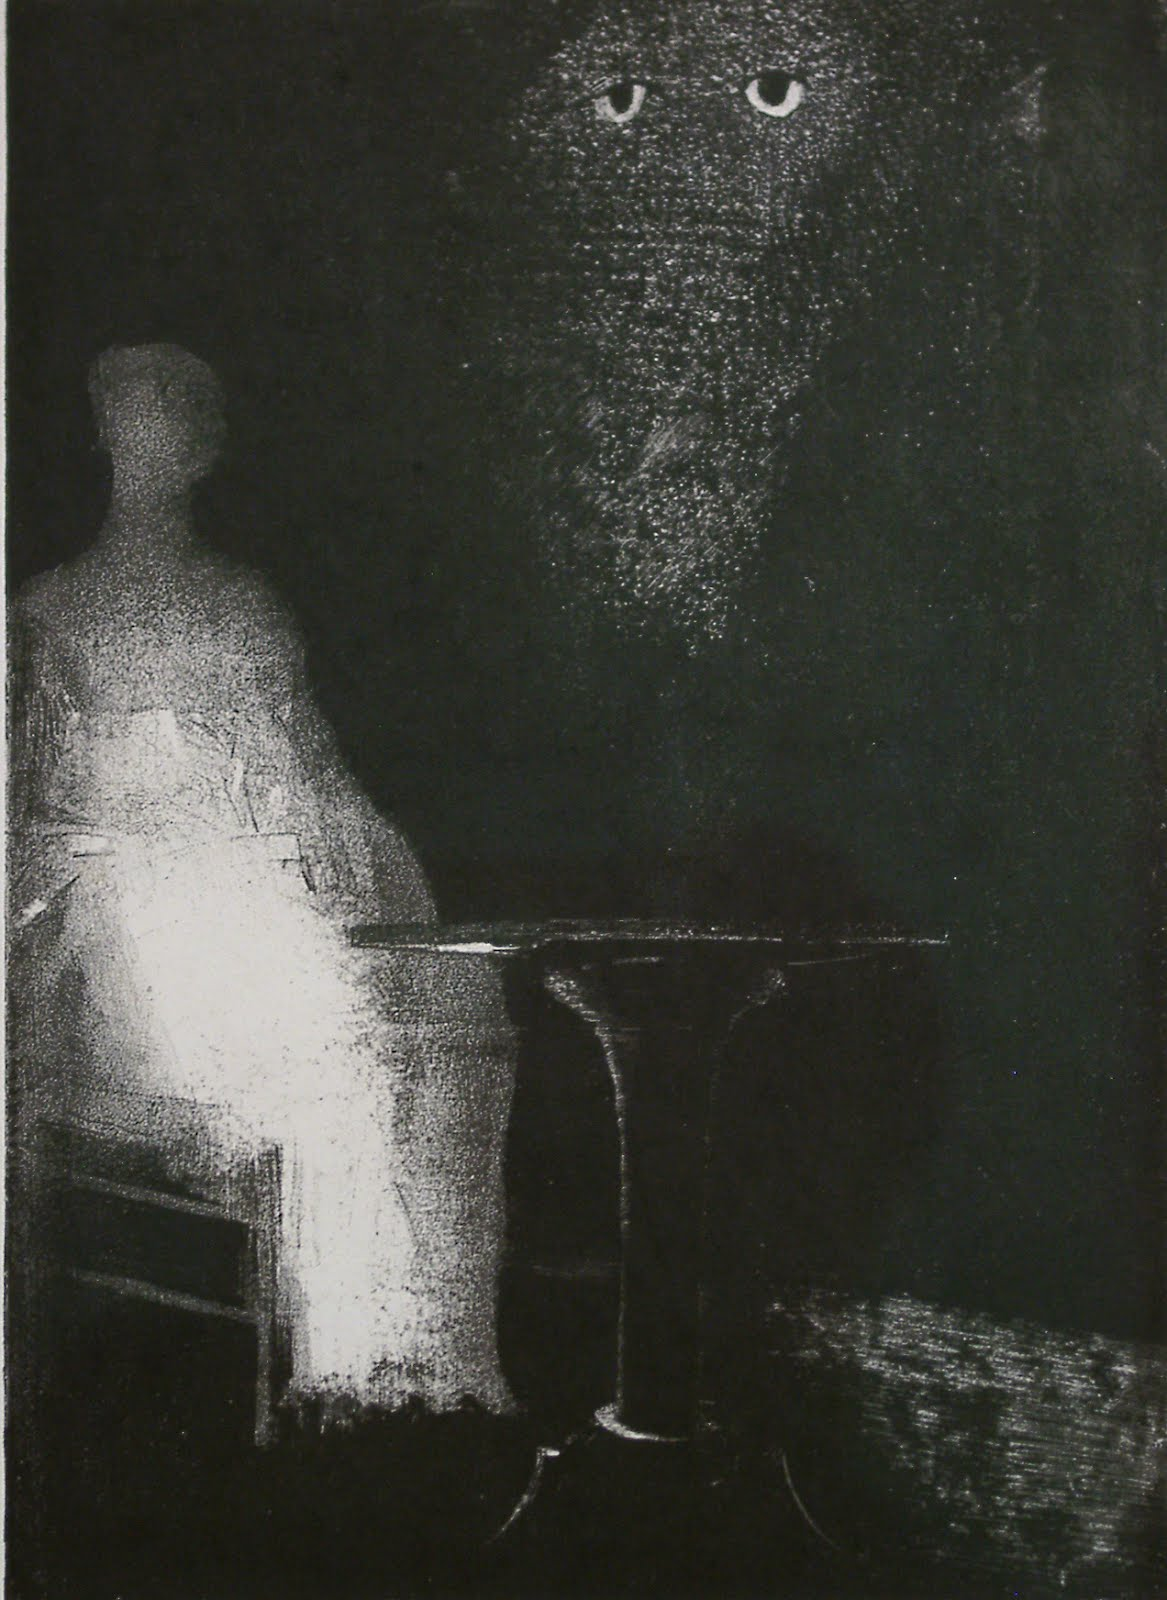 gr194-odilon-redon-1840-1916-i-saw-above-the-misty-outline-of-a-human-form-1896[1]